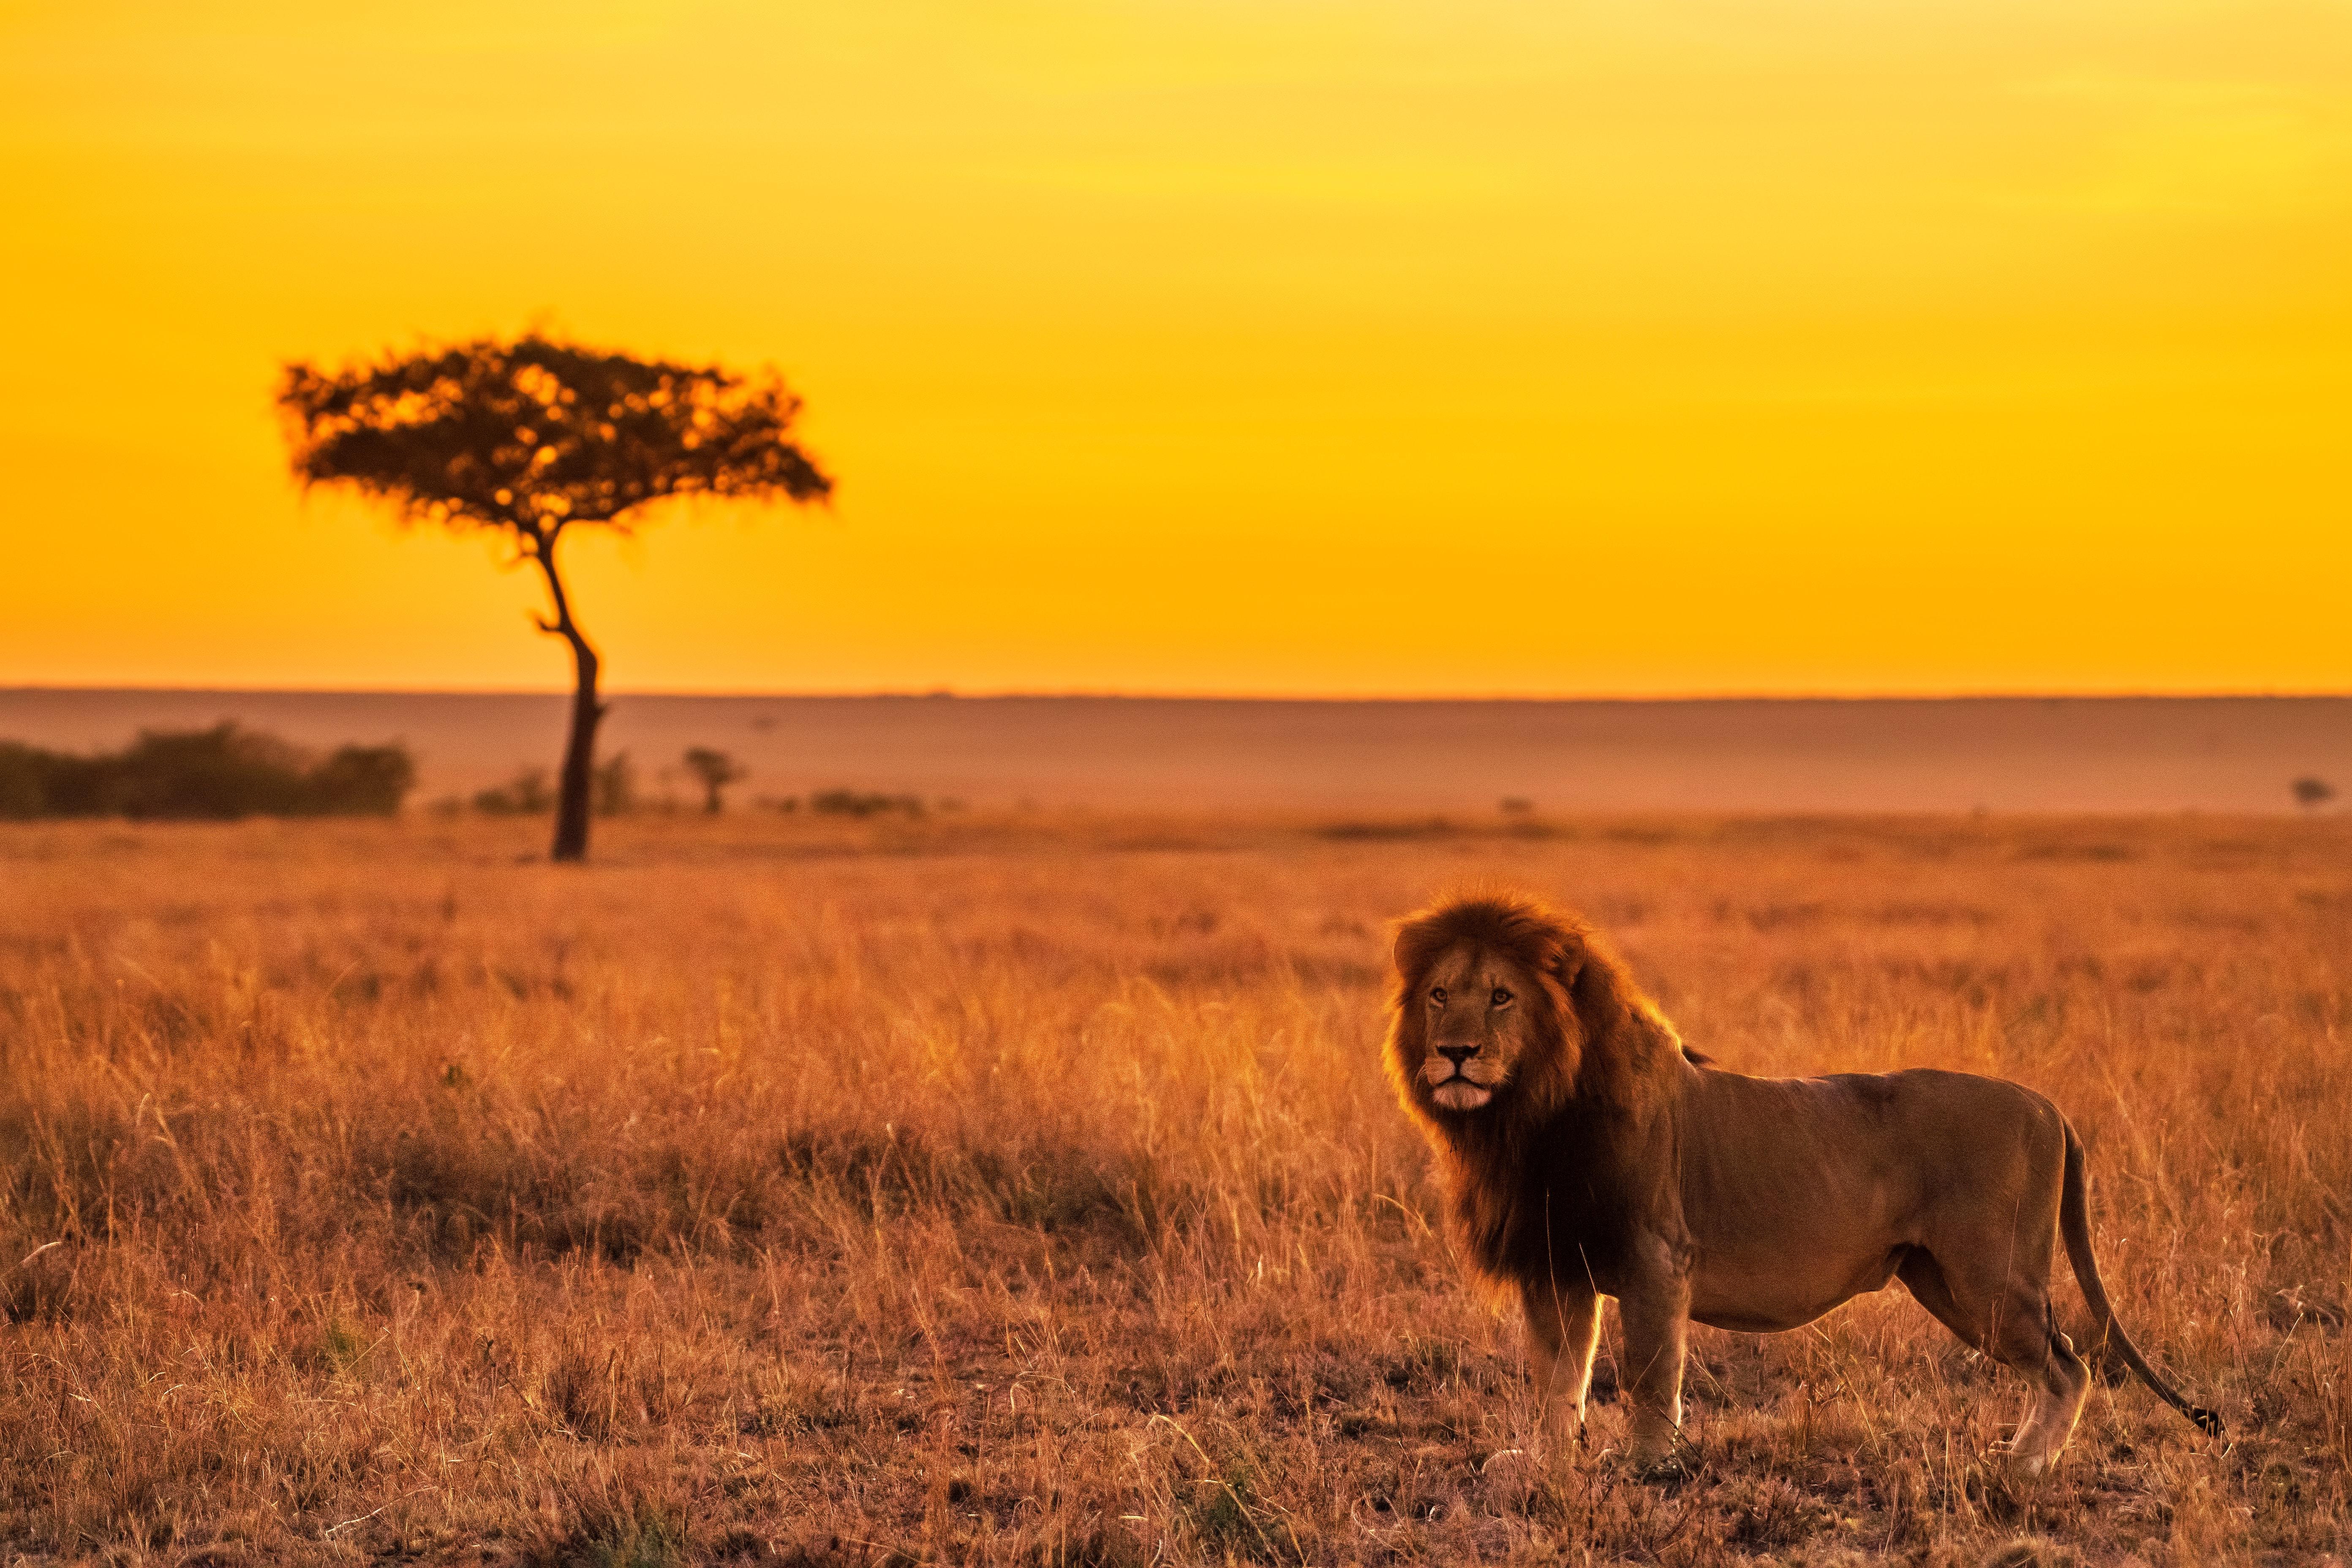 lion on grass field 4k 1629139770 - Lion On Grass Field 4k - Lion On Grass Field wallpapers, Lion On Grass Field 4k wallpapers